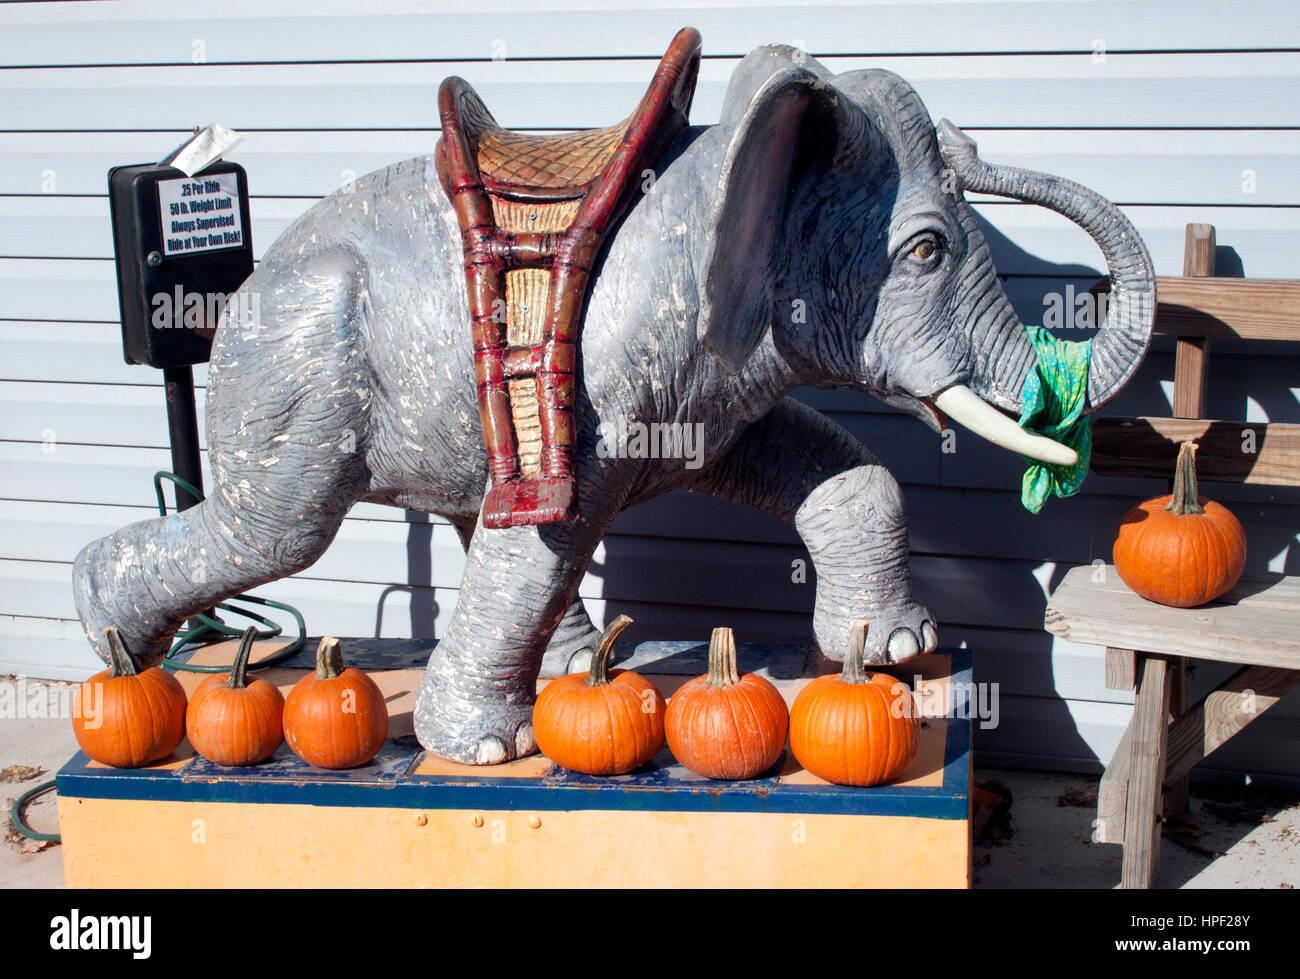 Mister Ed's Elephant Museum in Orrtanna Pennsylvania - Stock Image